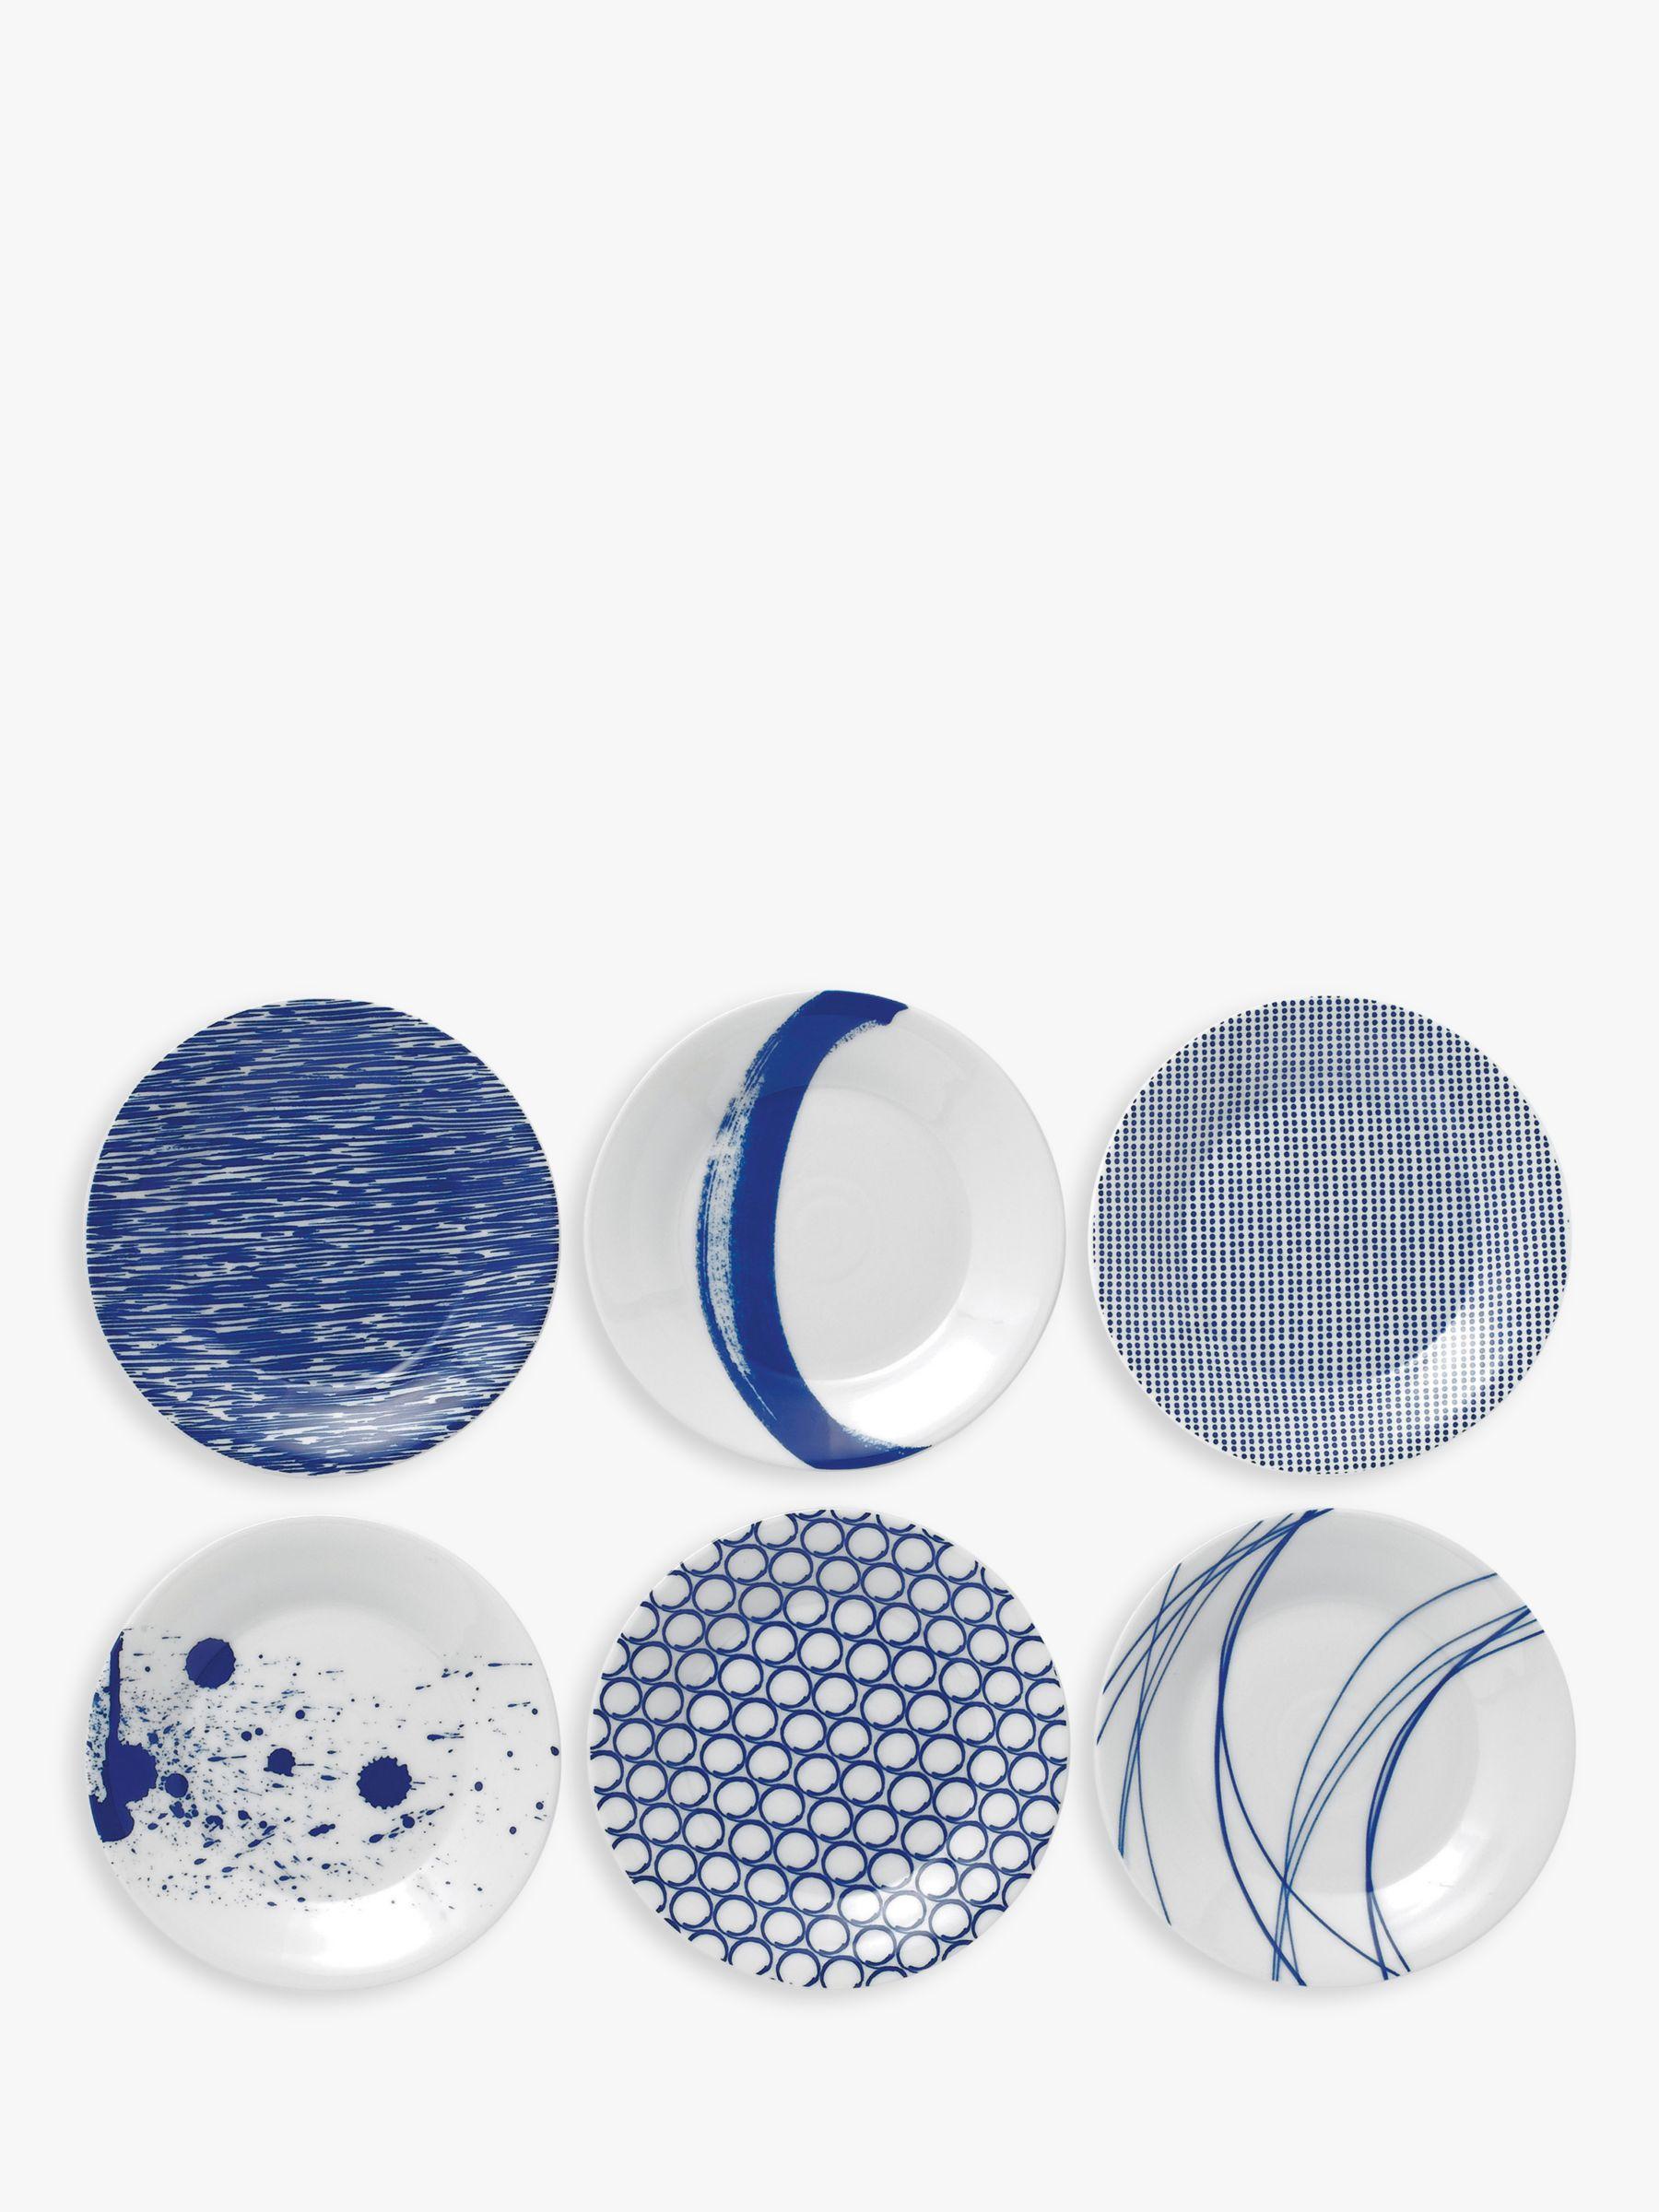 Royal Doulton Royal Doulton Pacific Porcelain Tapas Plates, Set of 6, 16cm, Blue